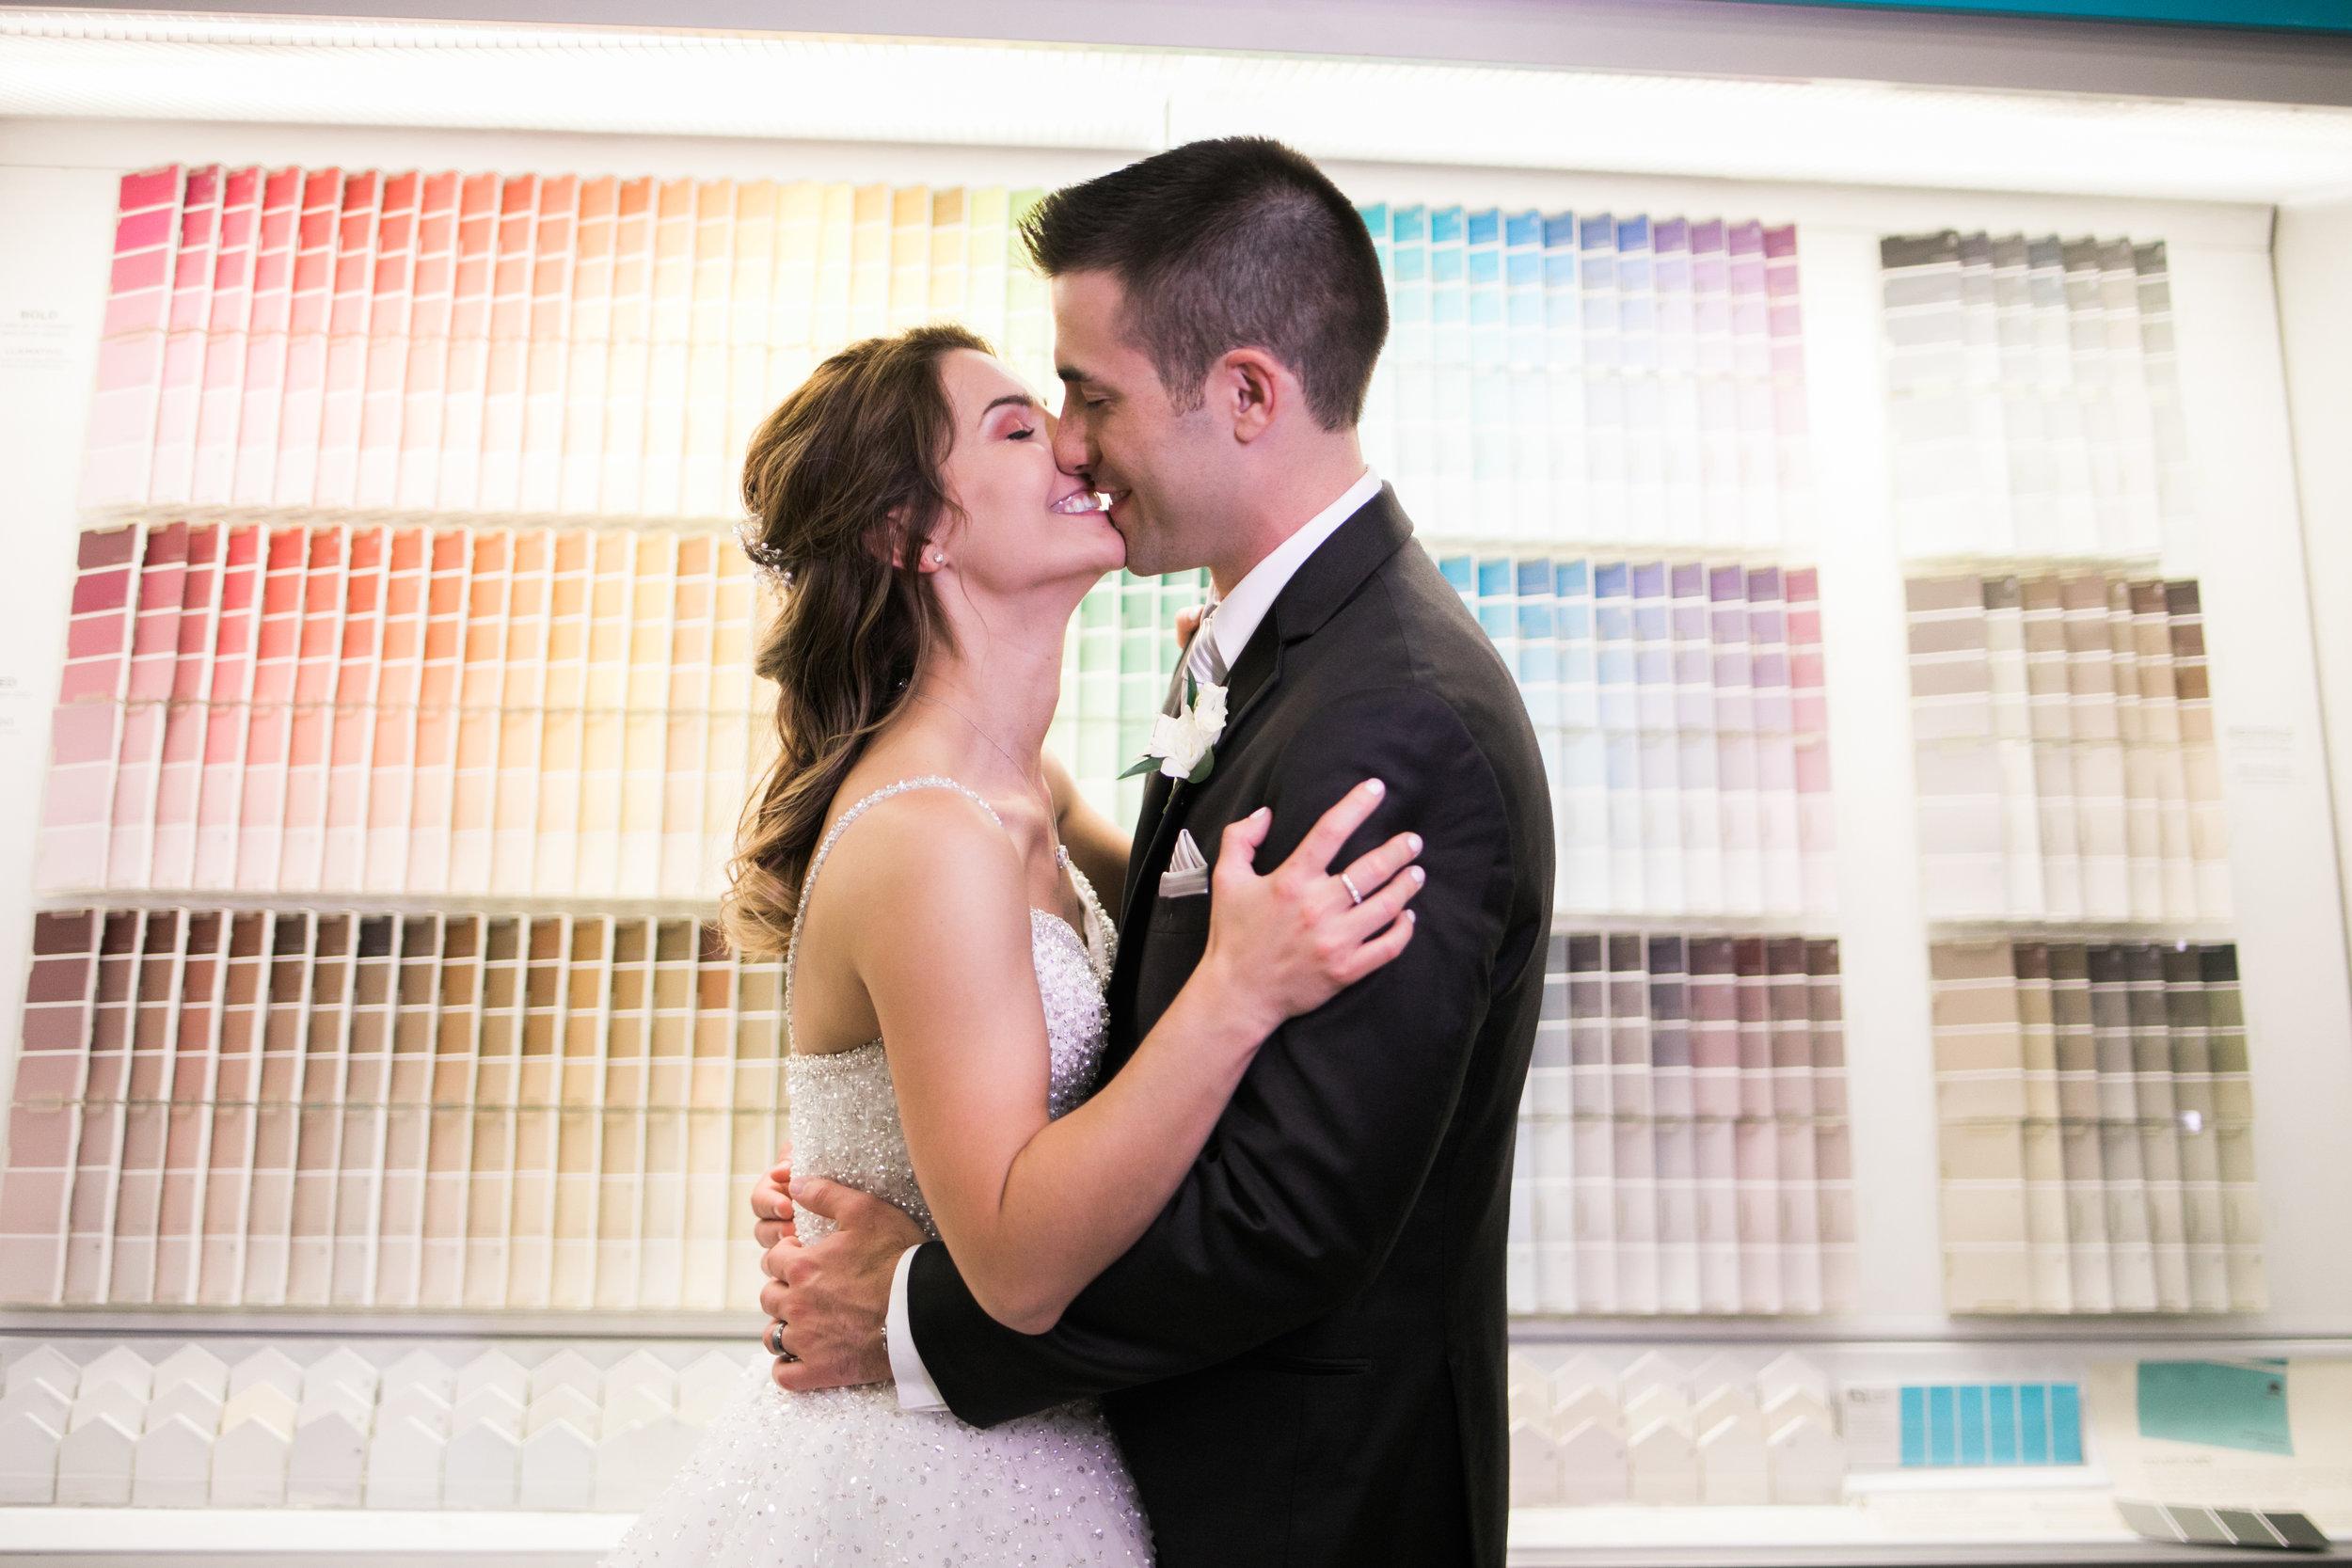 Wedding-couple-takes-photos-at-lowes-hardware-due-to-rain11.jpg